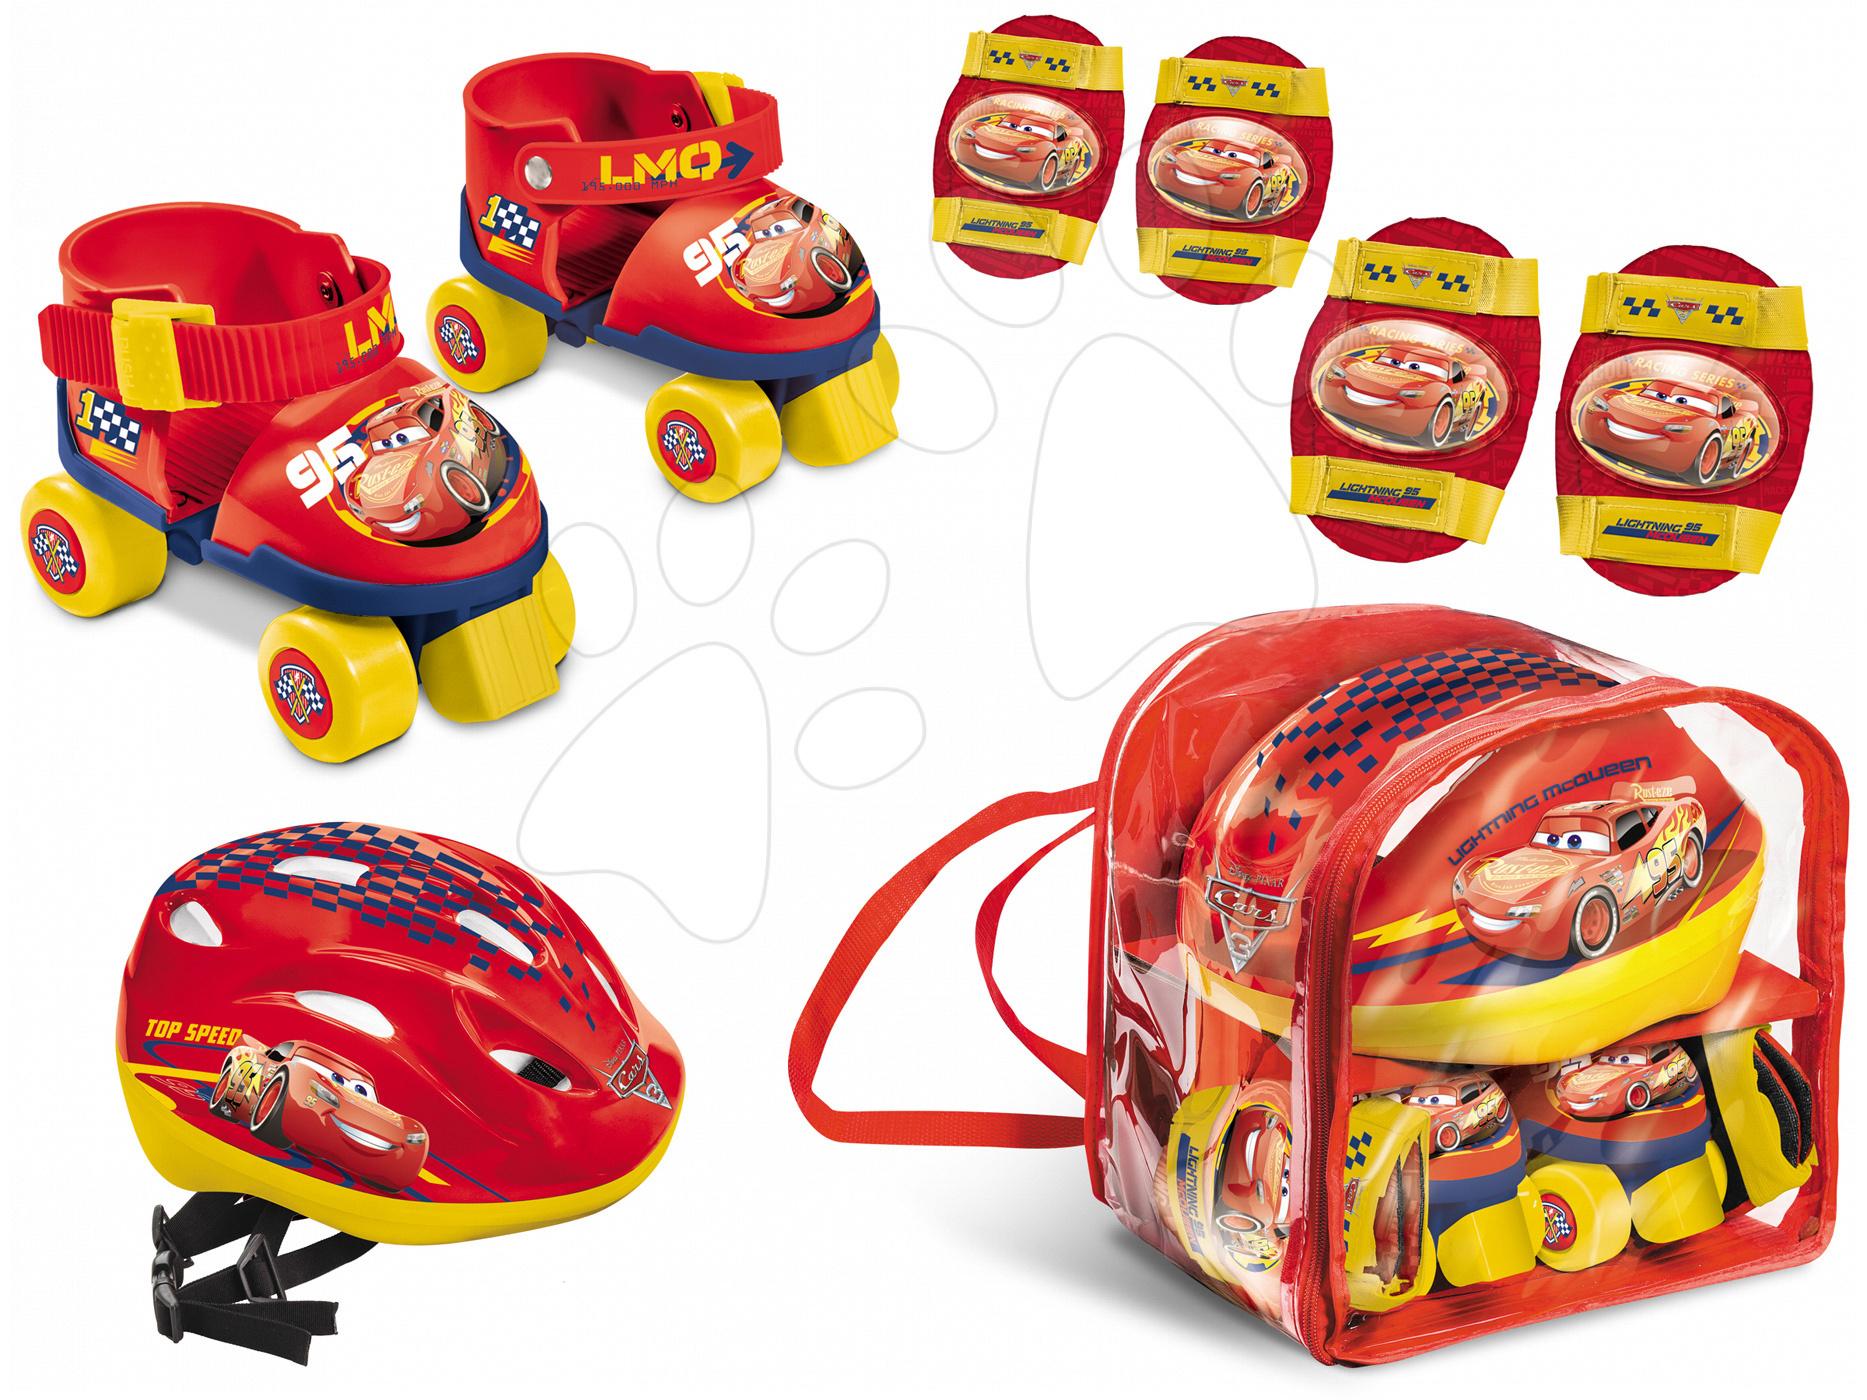 Kolečkové brusle Auta Mondo s chrániči a helmou velikost 22-29